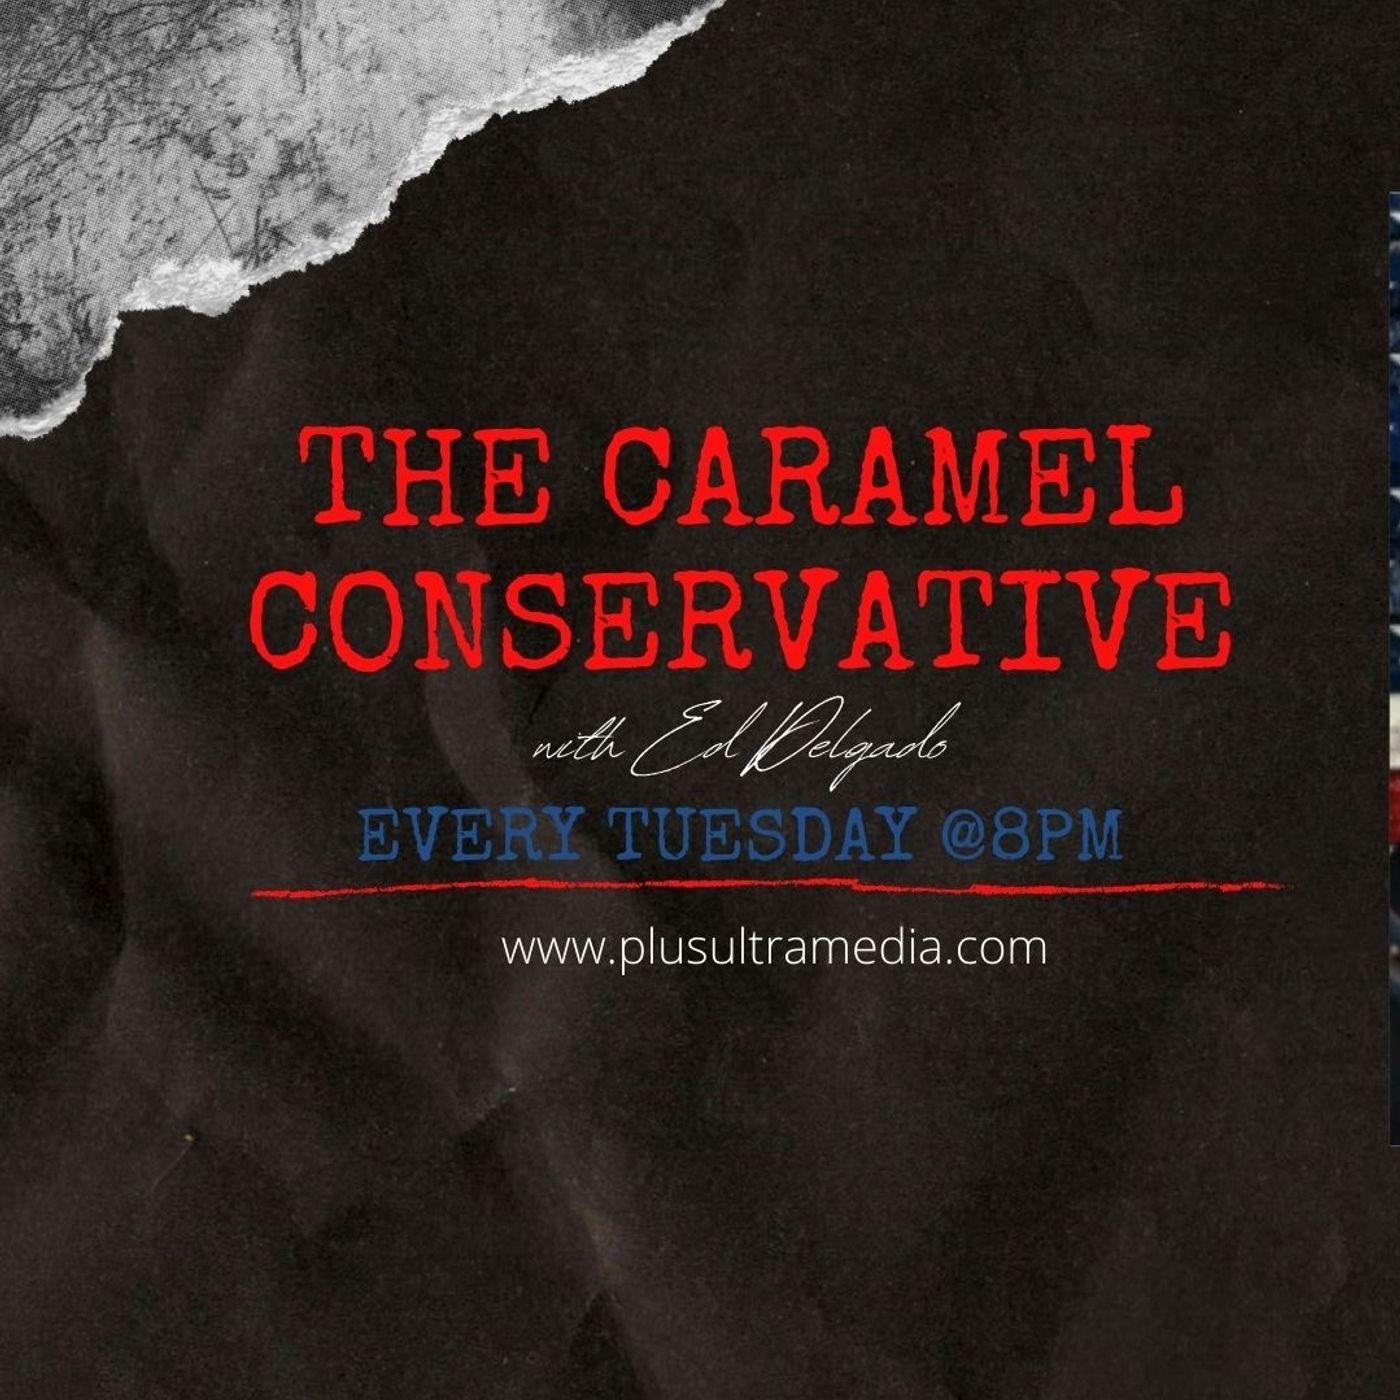 The Caramel Conservative Podcast